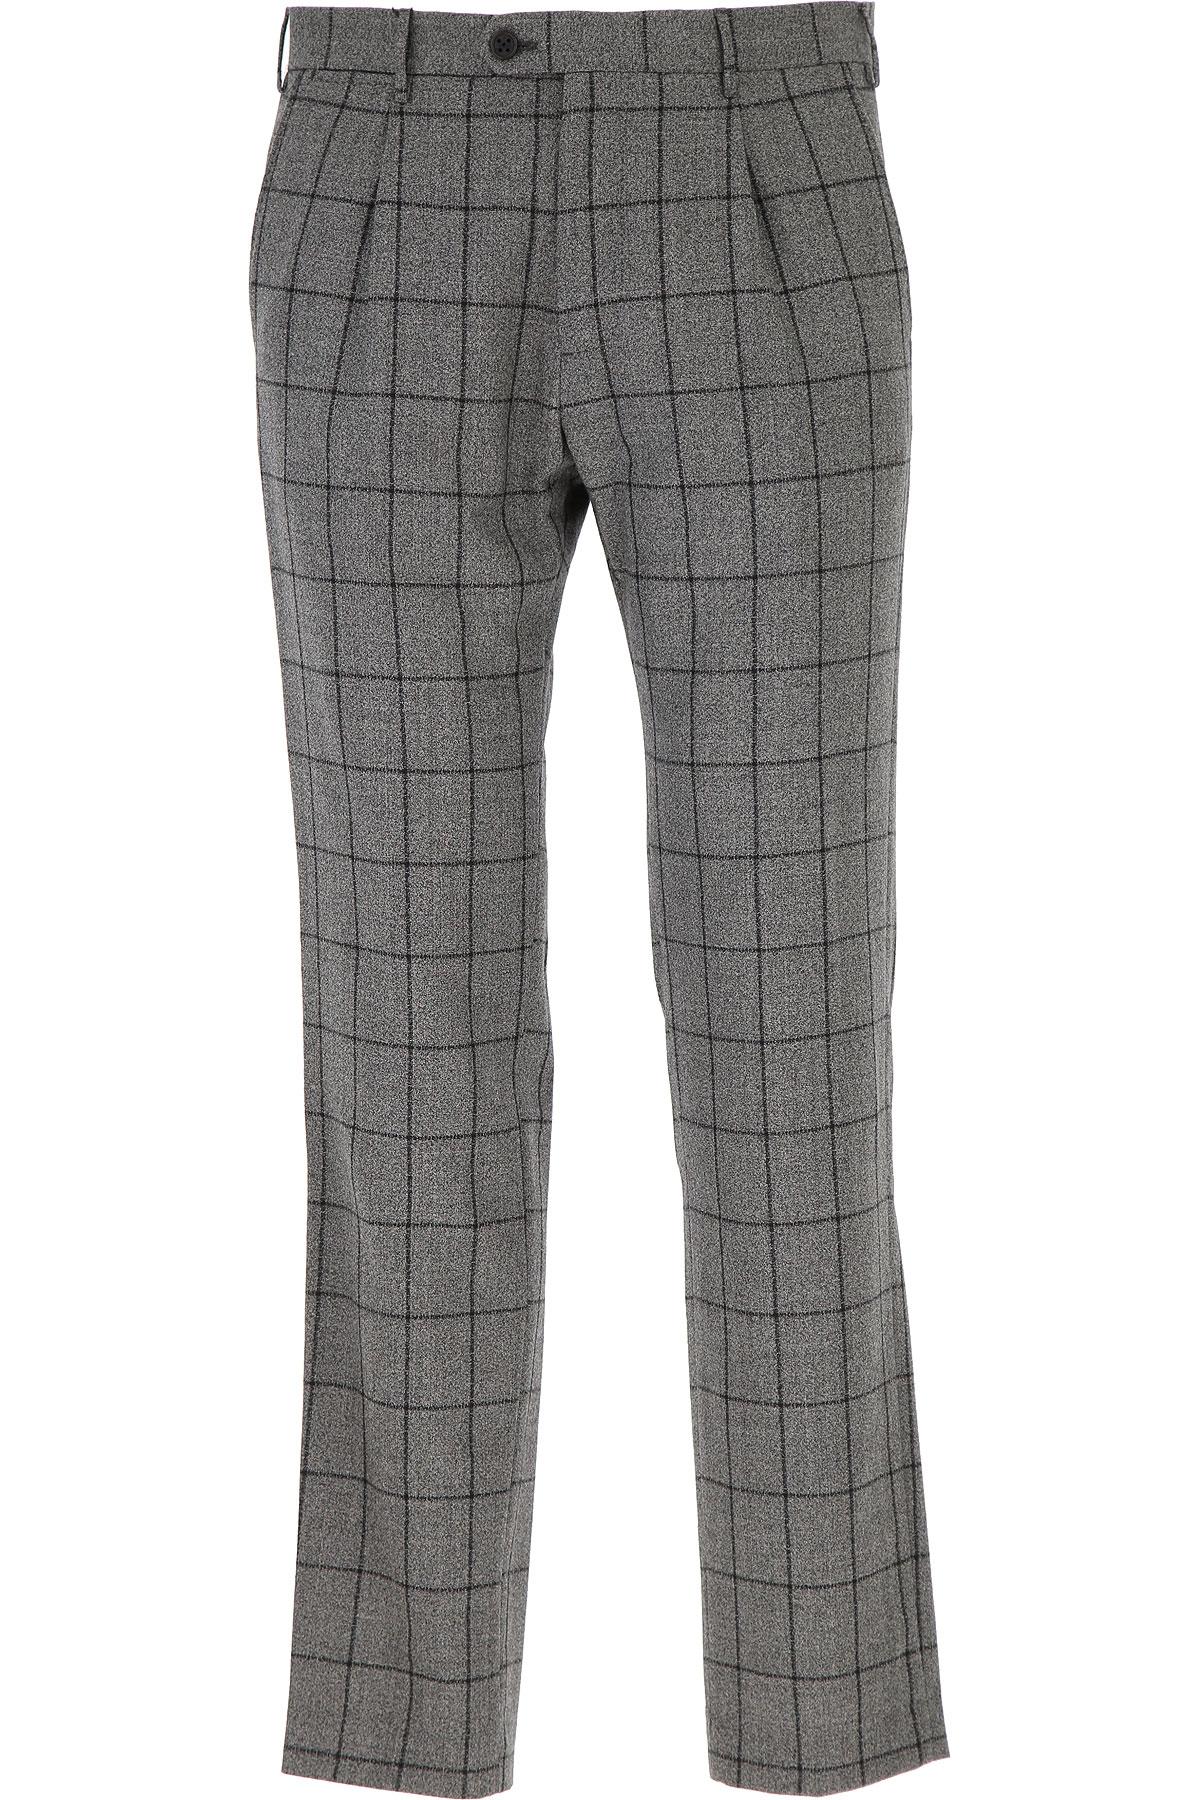 Image of Berwich Pants for Men, Medium Grey, Virgin wool, 2017, 30 34 36 38